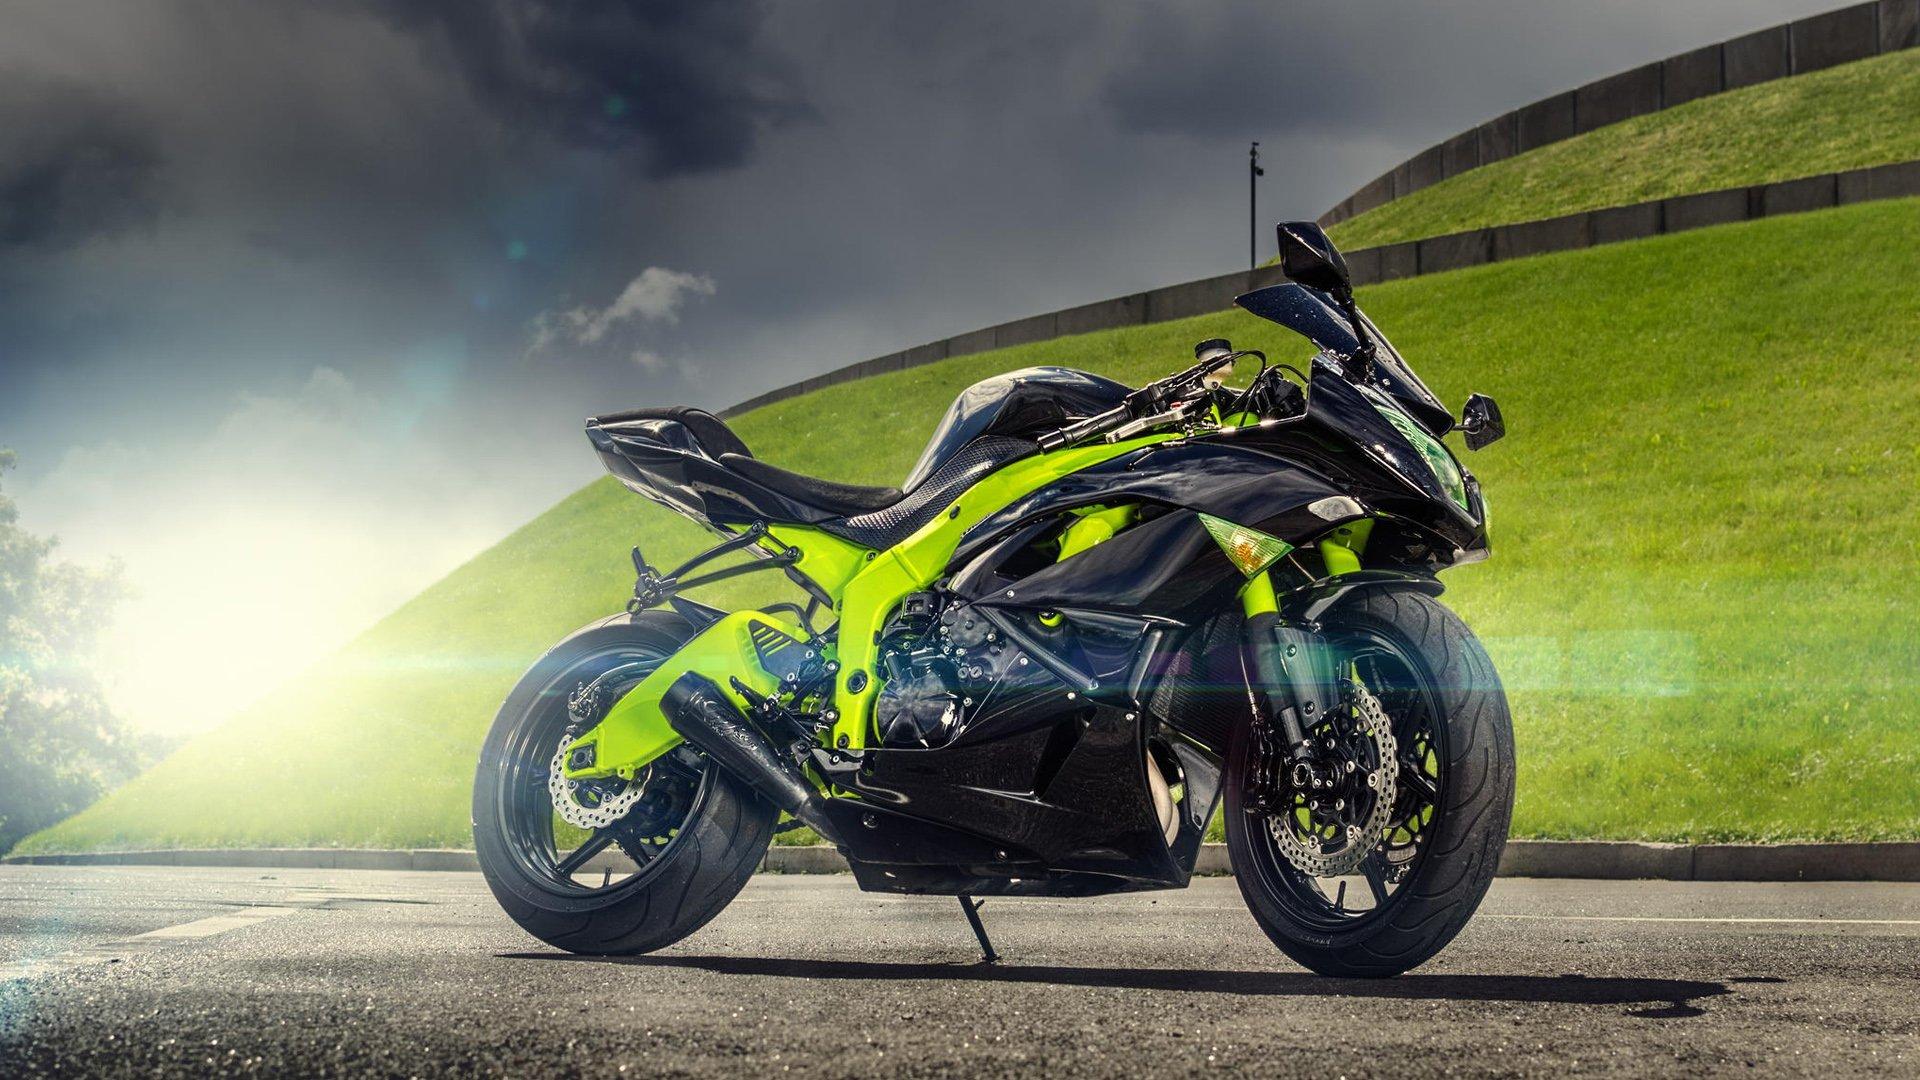 Kawasaki Ninja ZX6R, HD Bikes, 4k Wallpapers, Images